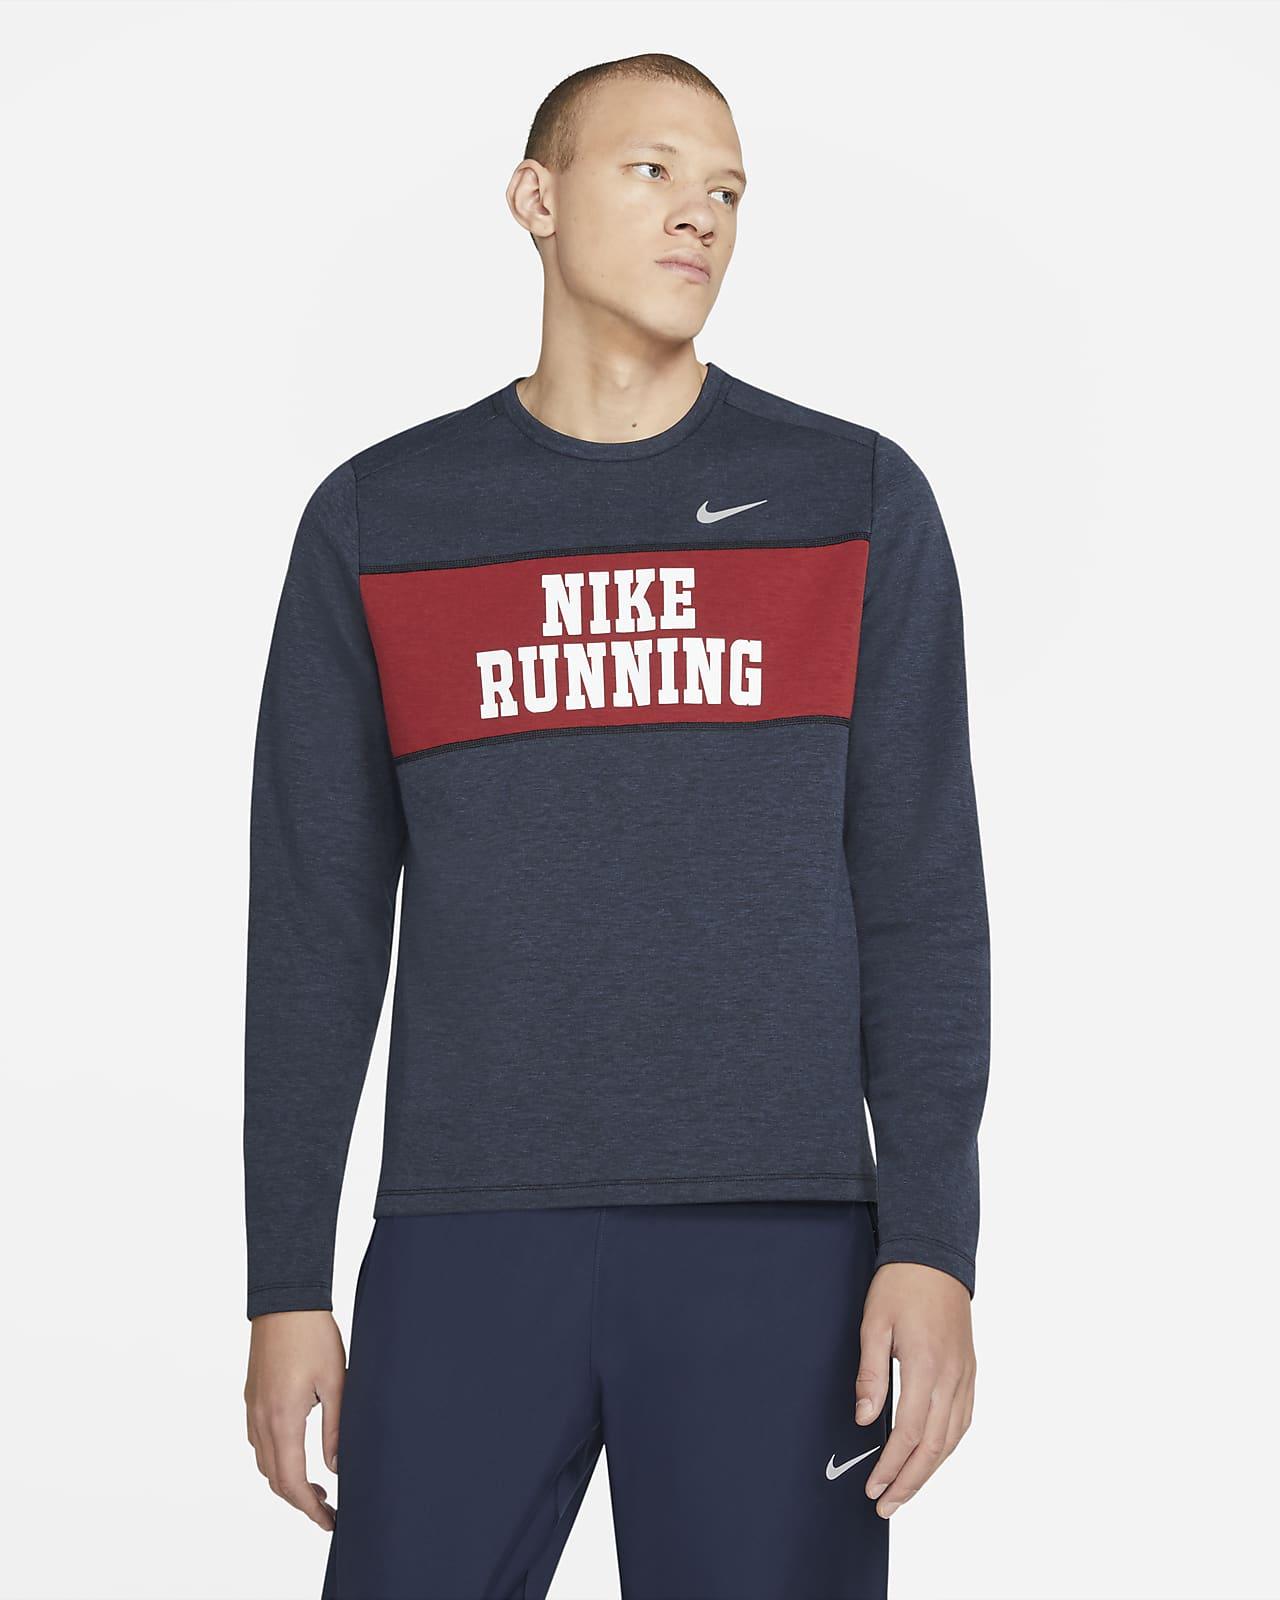 Nike Dri-FIT Heritage Men's Running Crew